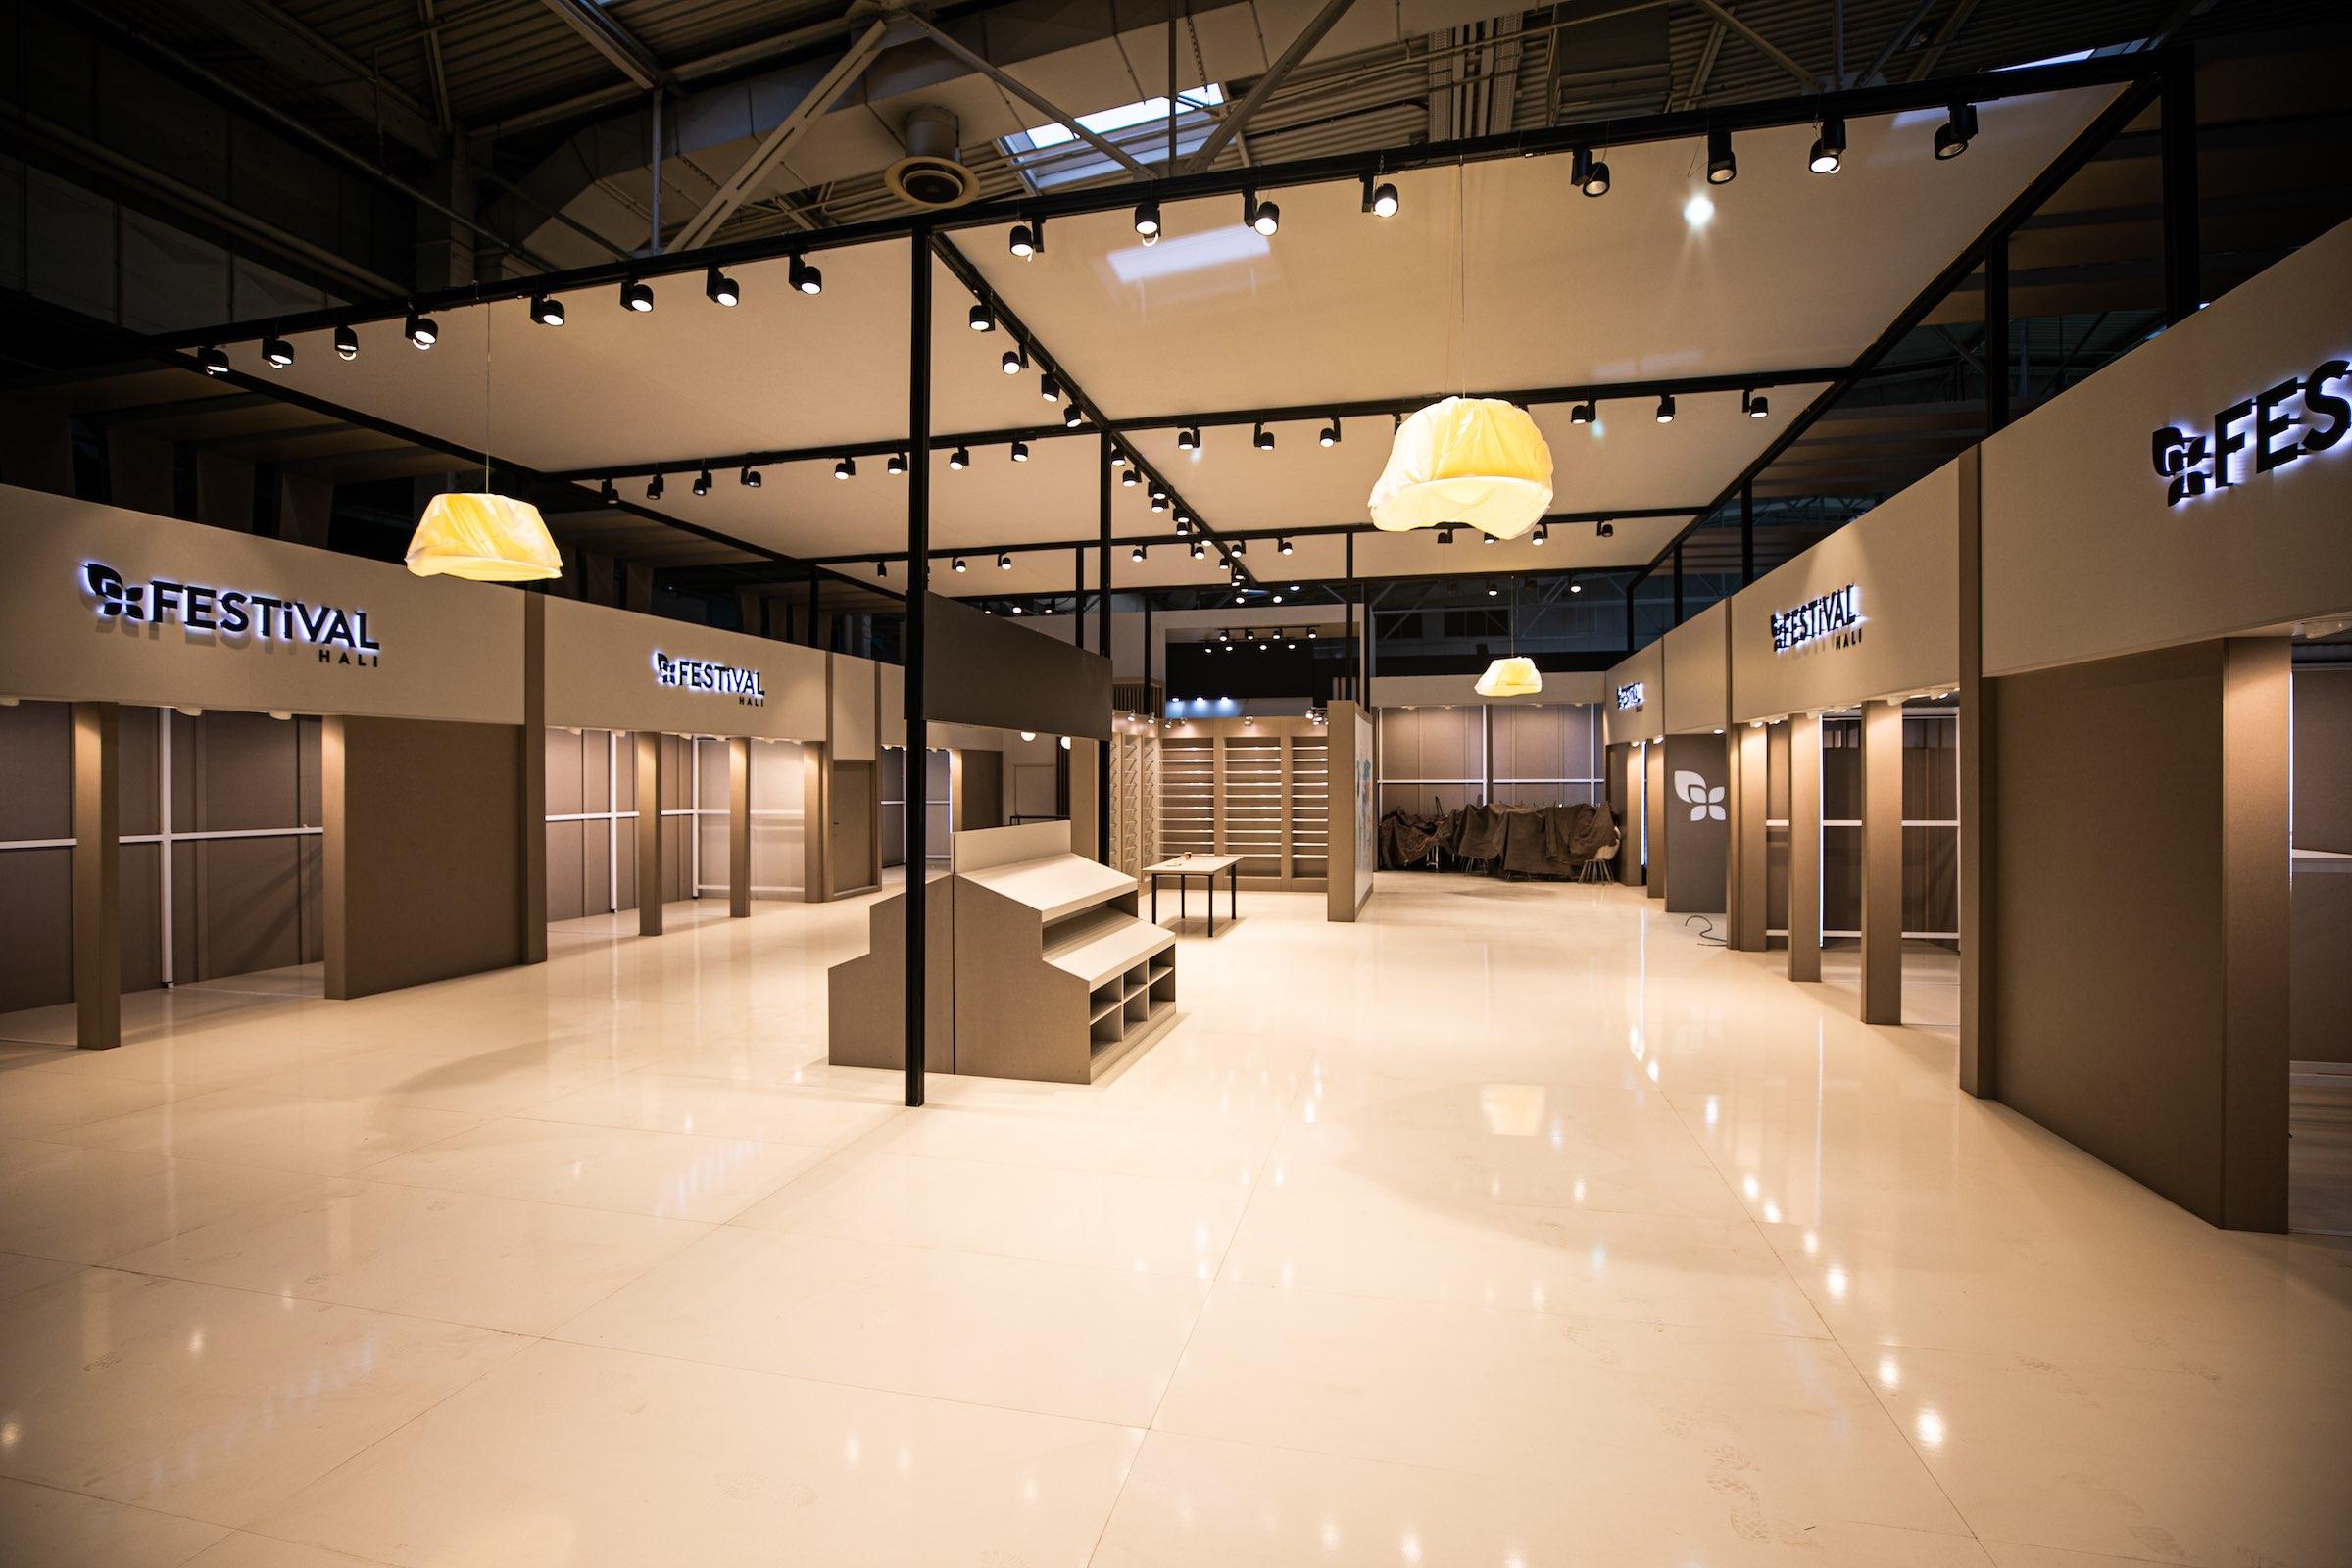 Messebauer | Messebau | Standbauer | Hannover | Traversen | Messetechnik | Lichttechnik | Tontechnik | Beschallung | Planung | Konzeption | Lieferung | 3D | CAD | Mieten | Buchen | Lehmann | Eventservice